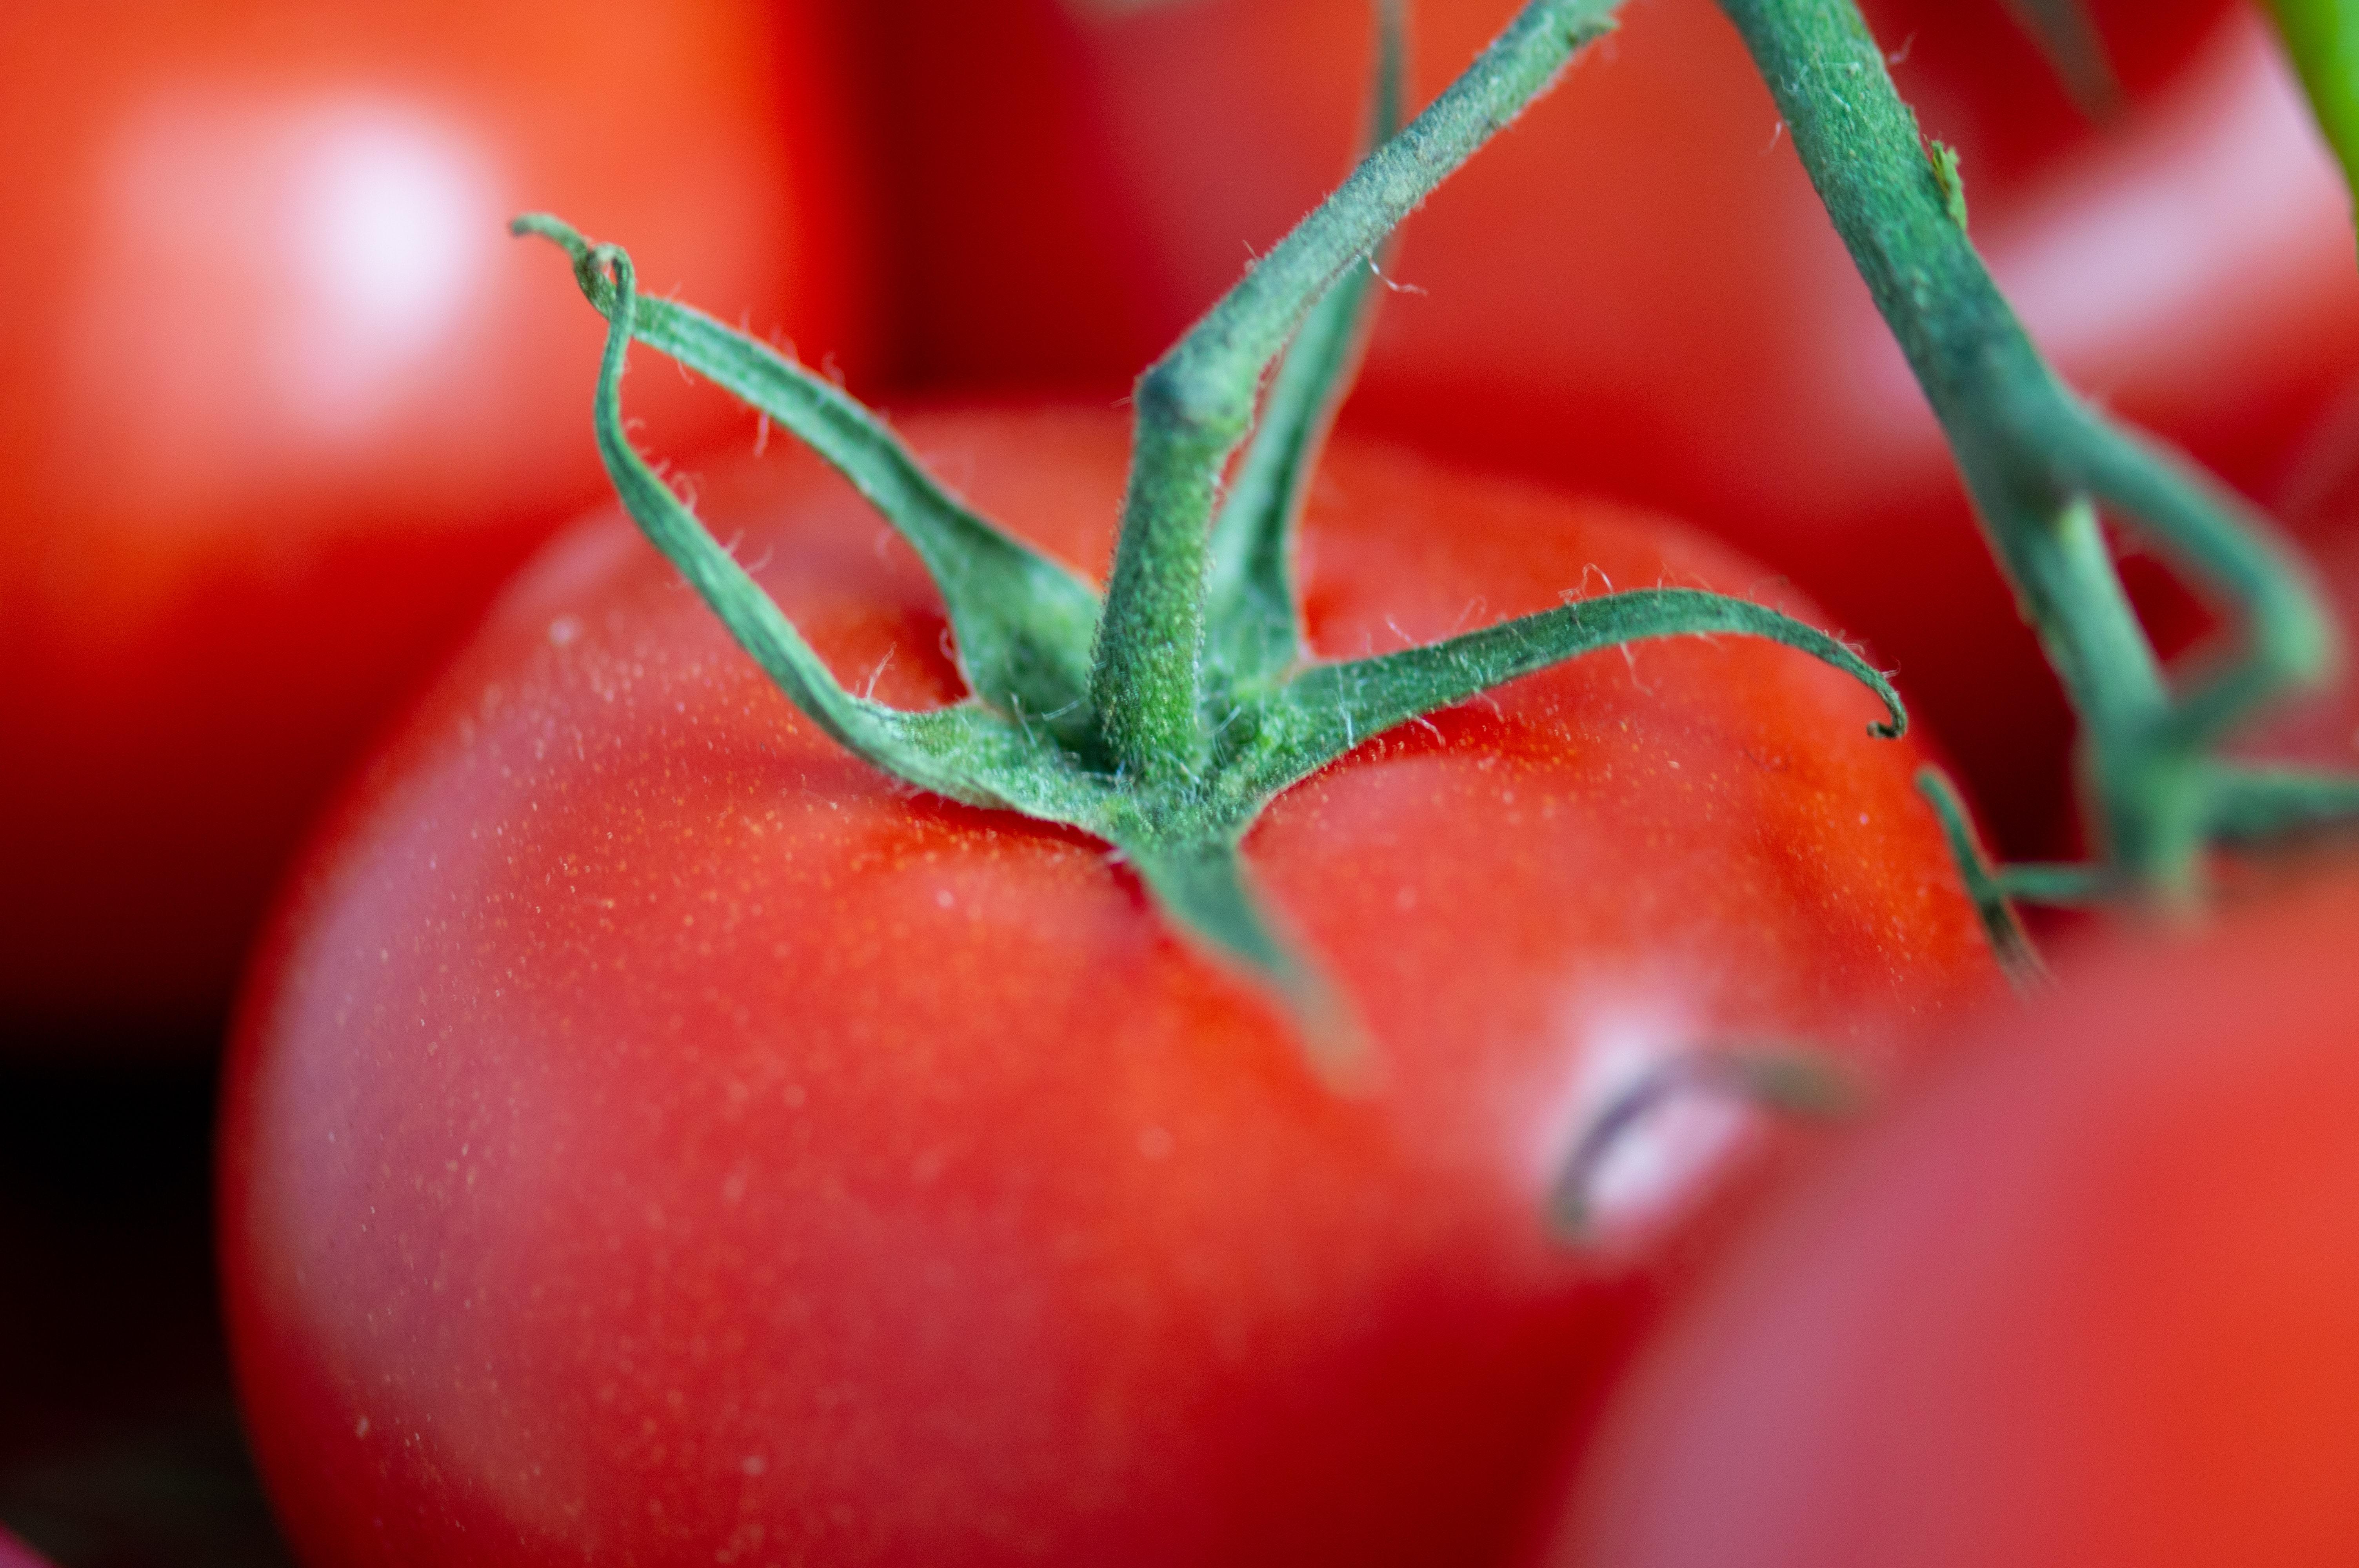 Feature studies fruit veg